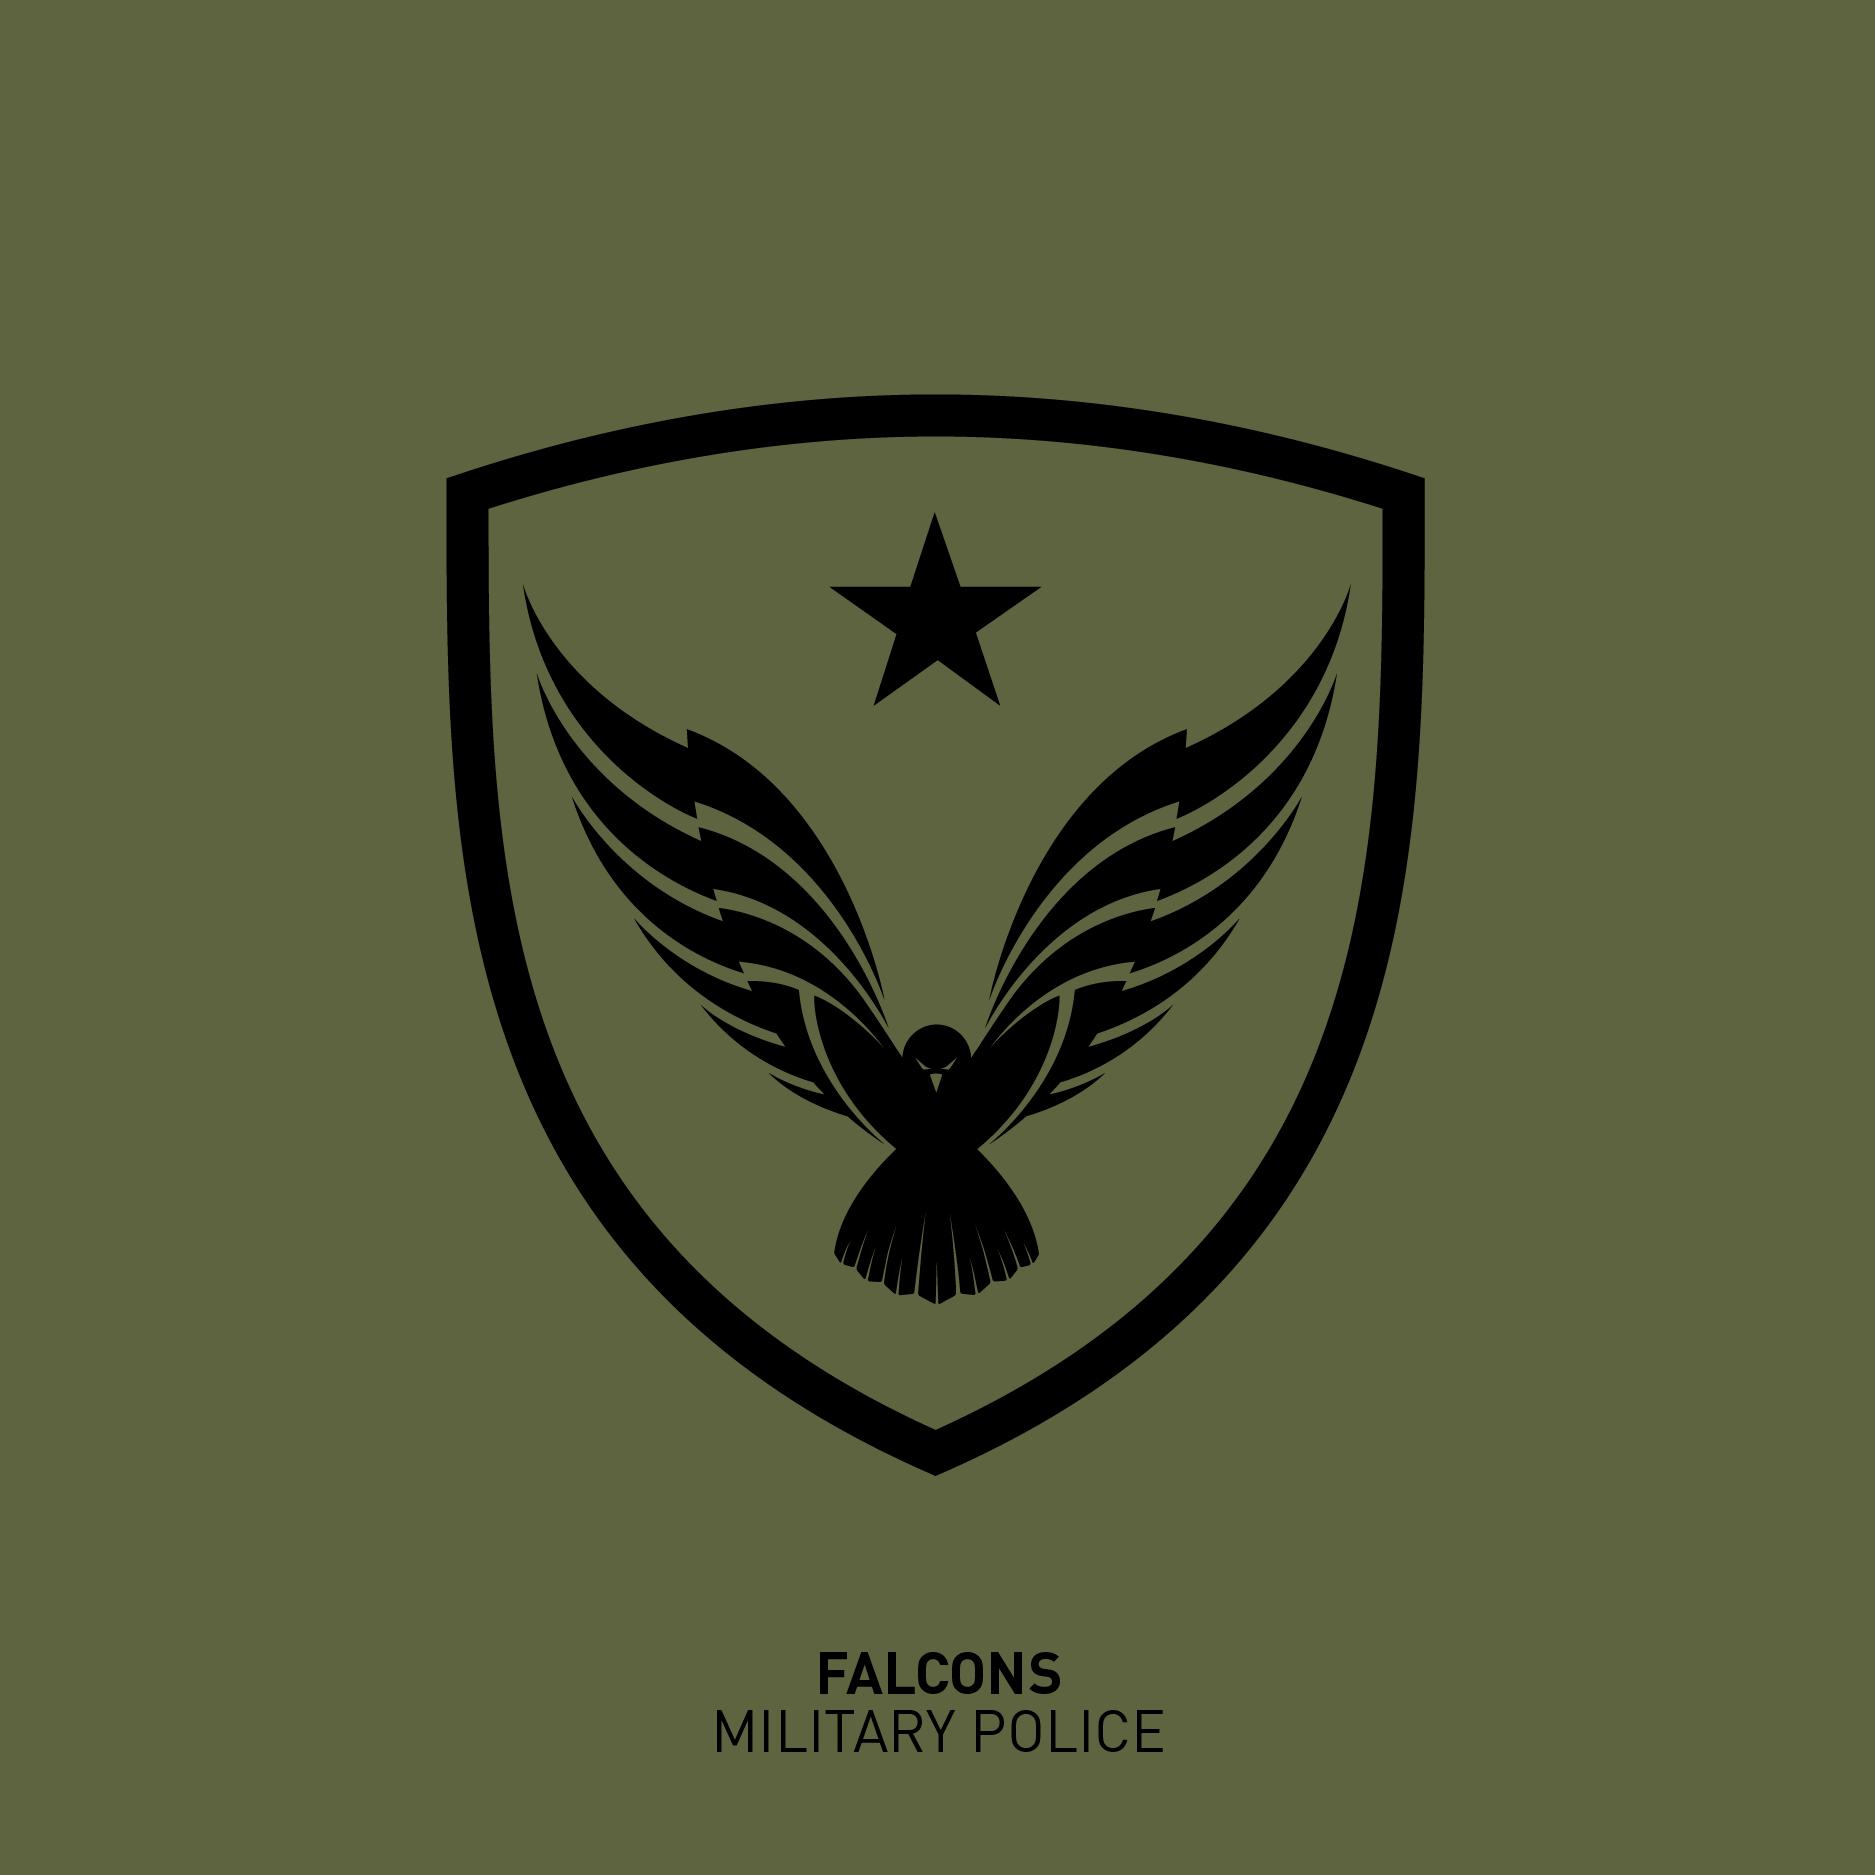 02falcons-01